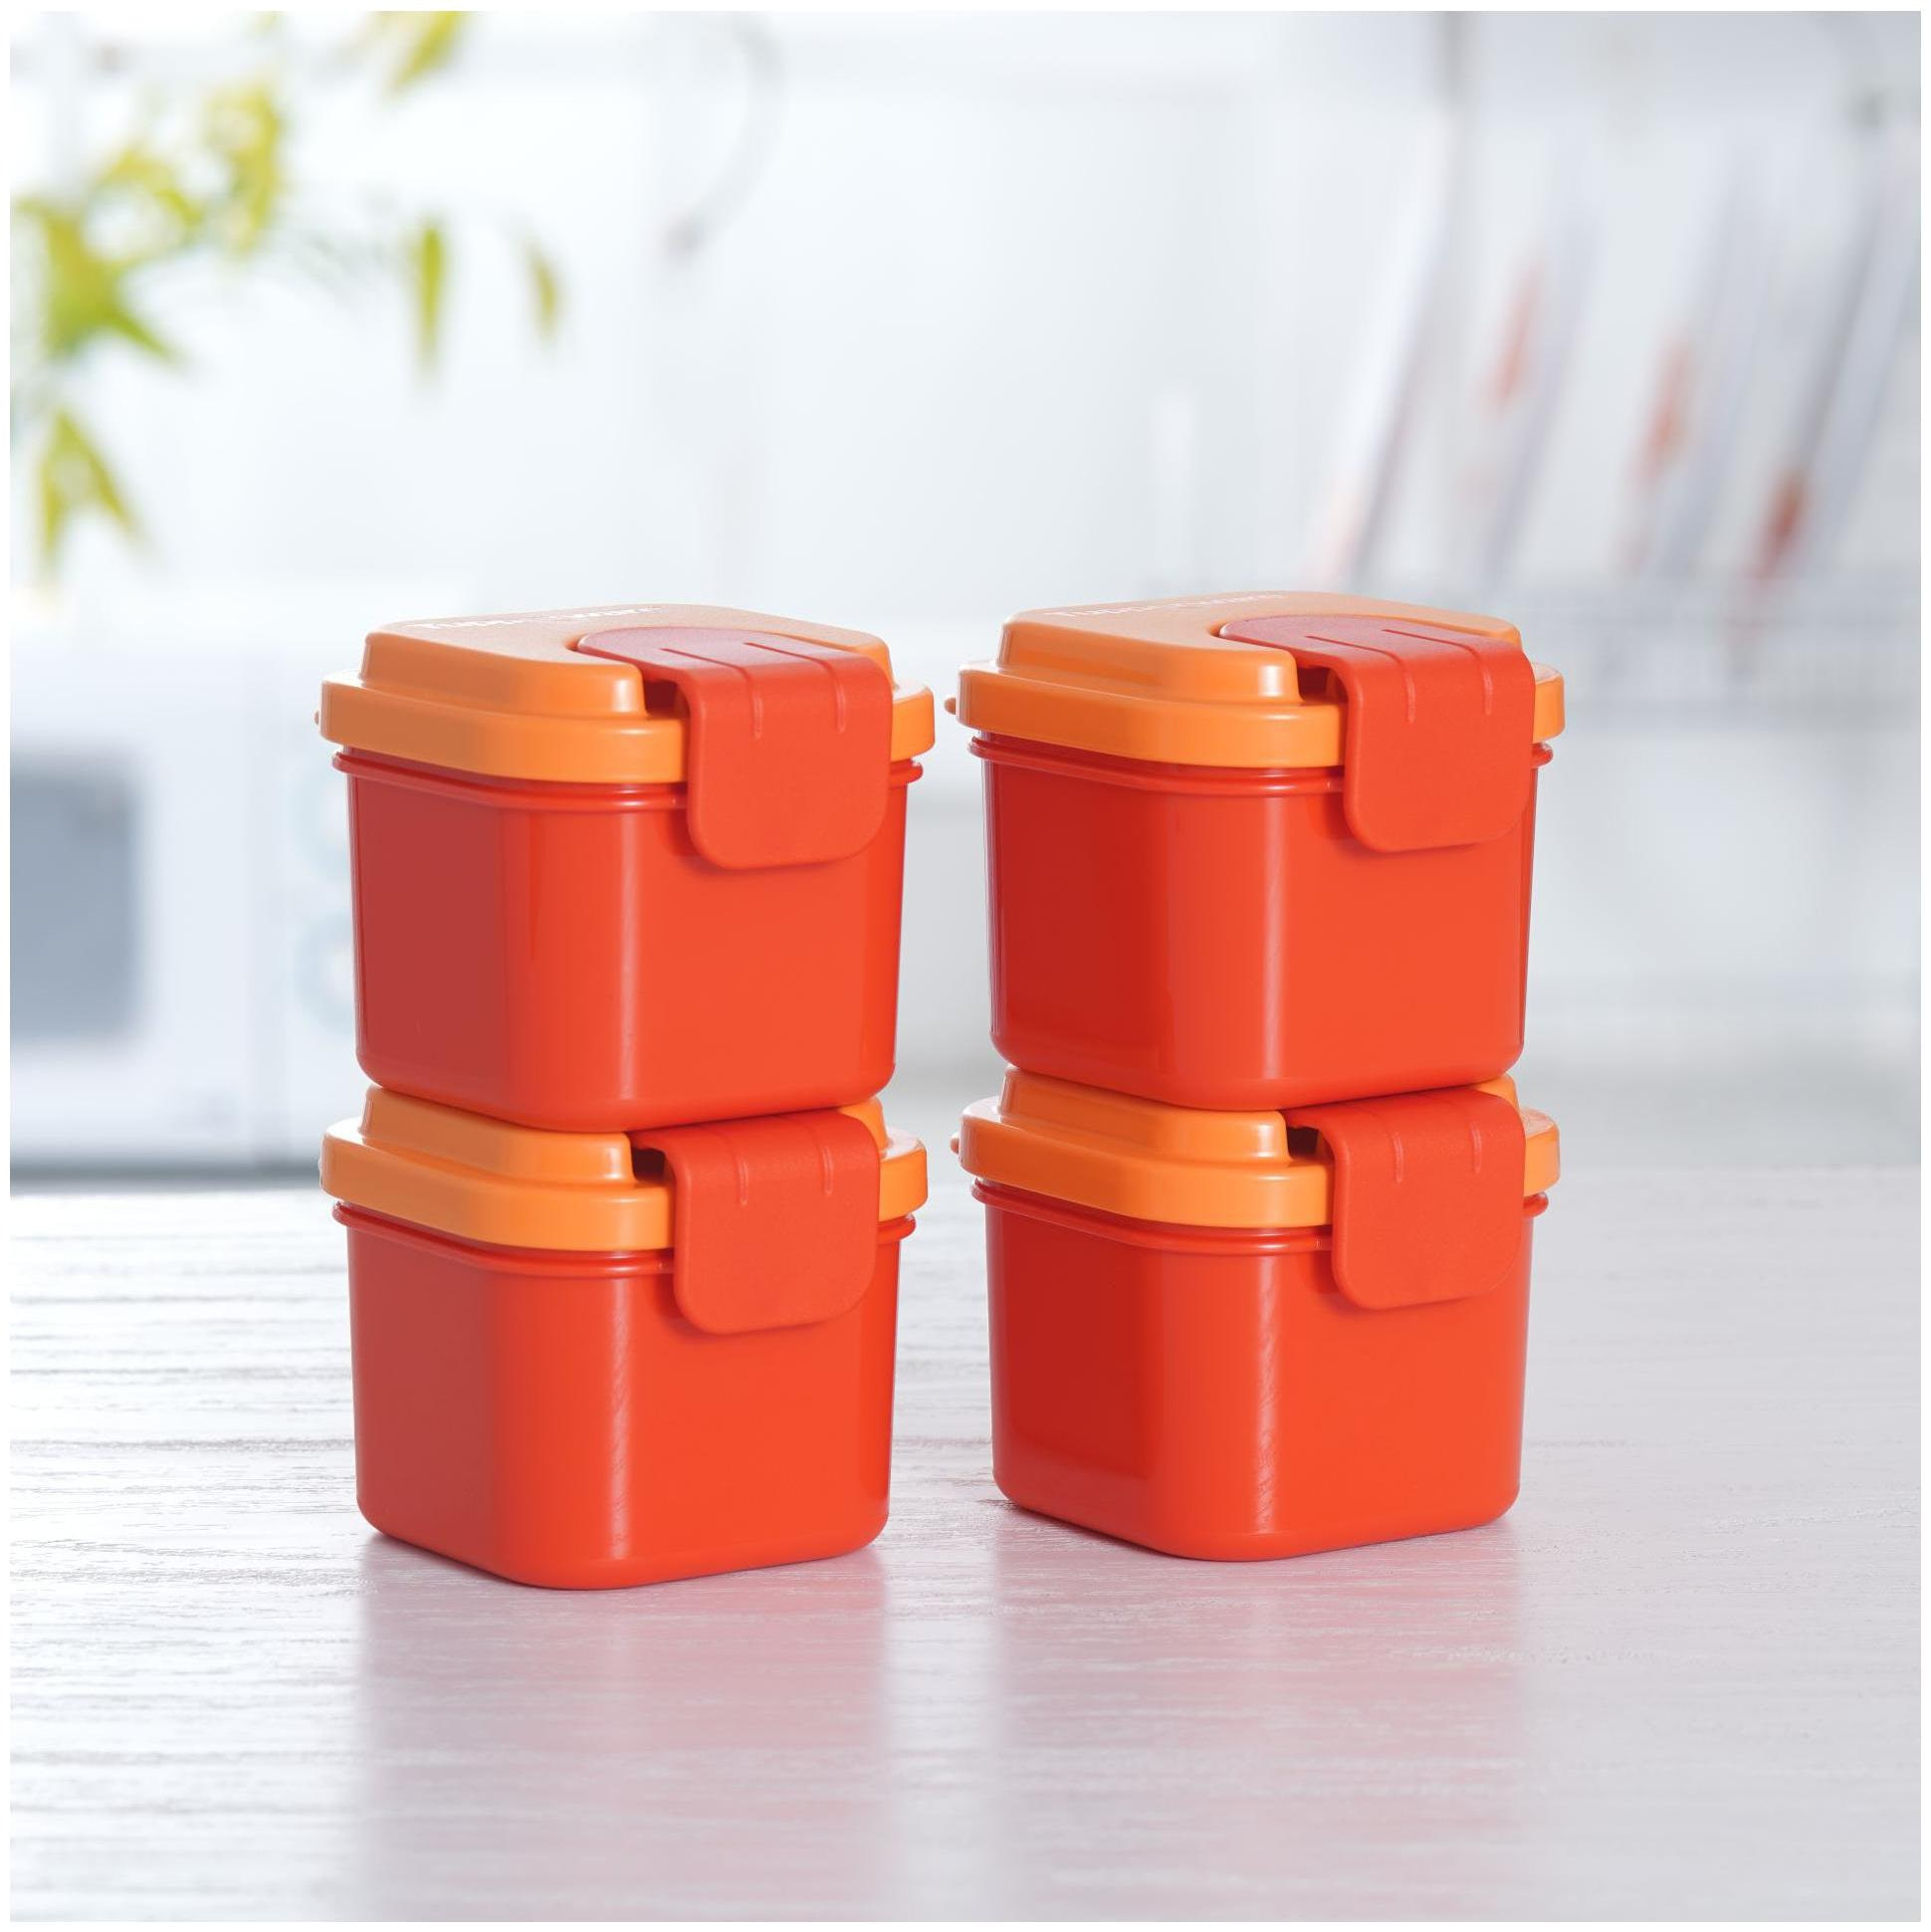 Tupperware 4 Containers Plastic Lunch Box   Orange